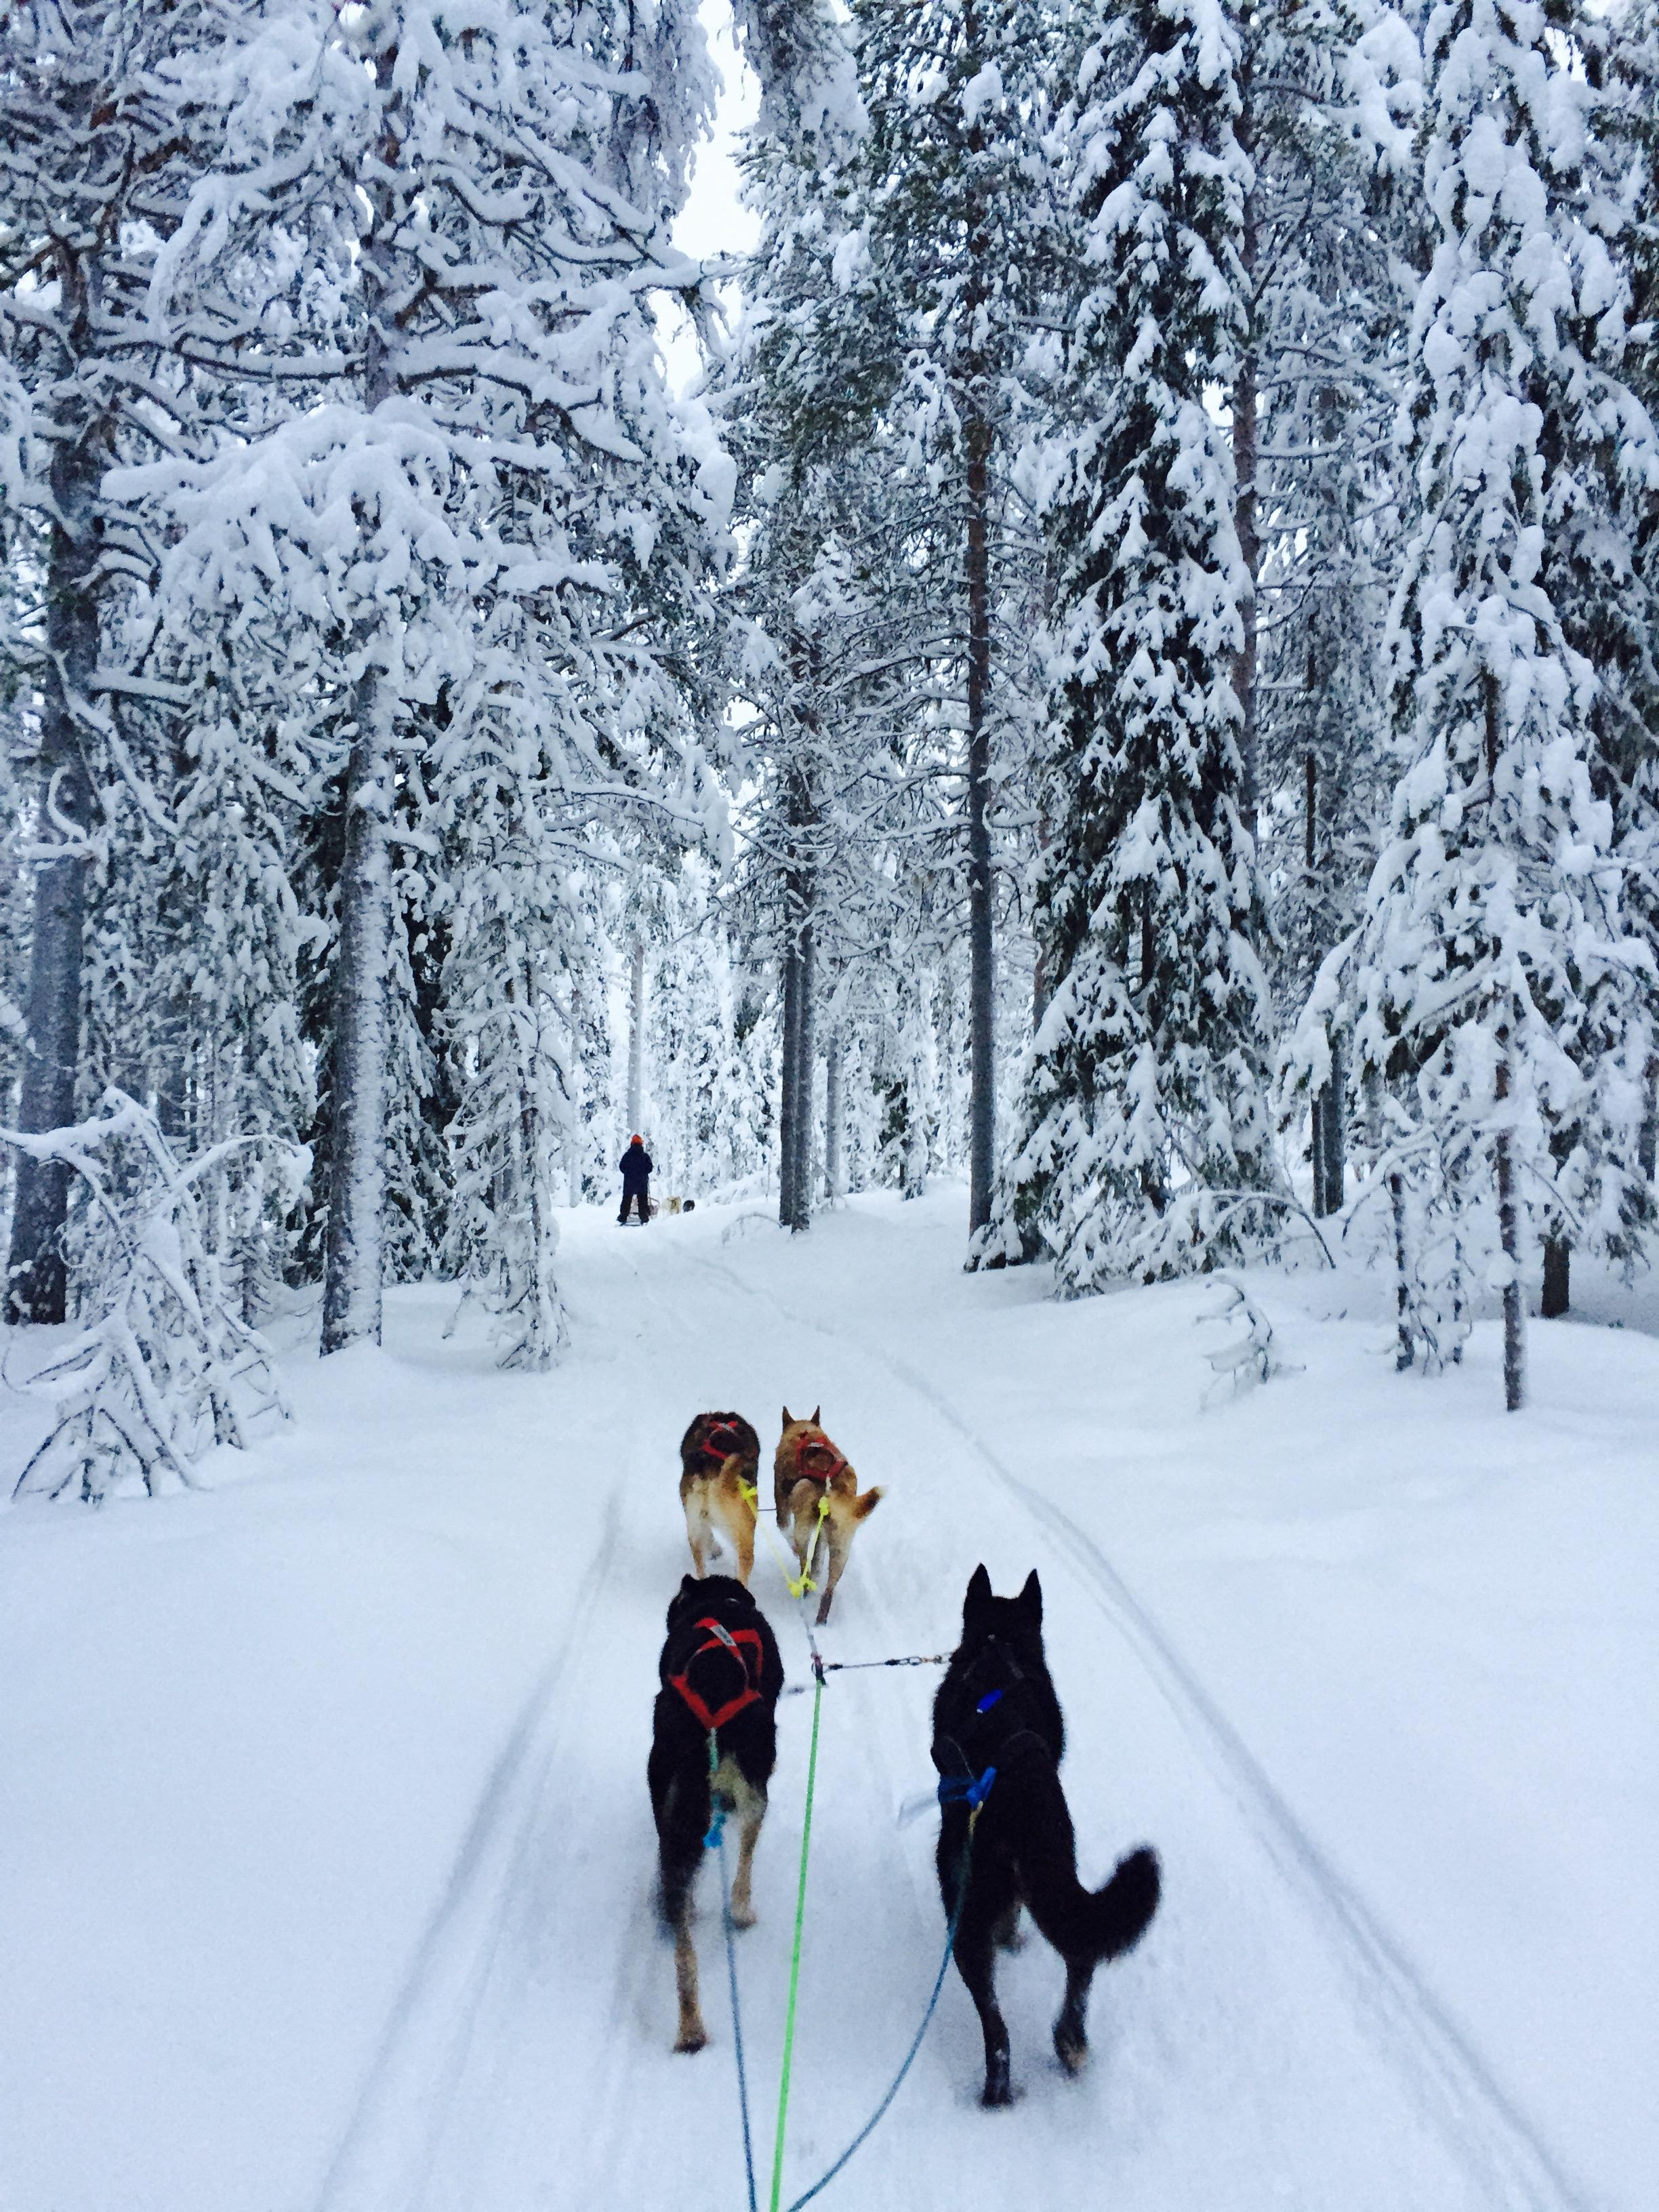 dogsledding in snowy taiga forest.jpeg